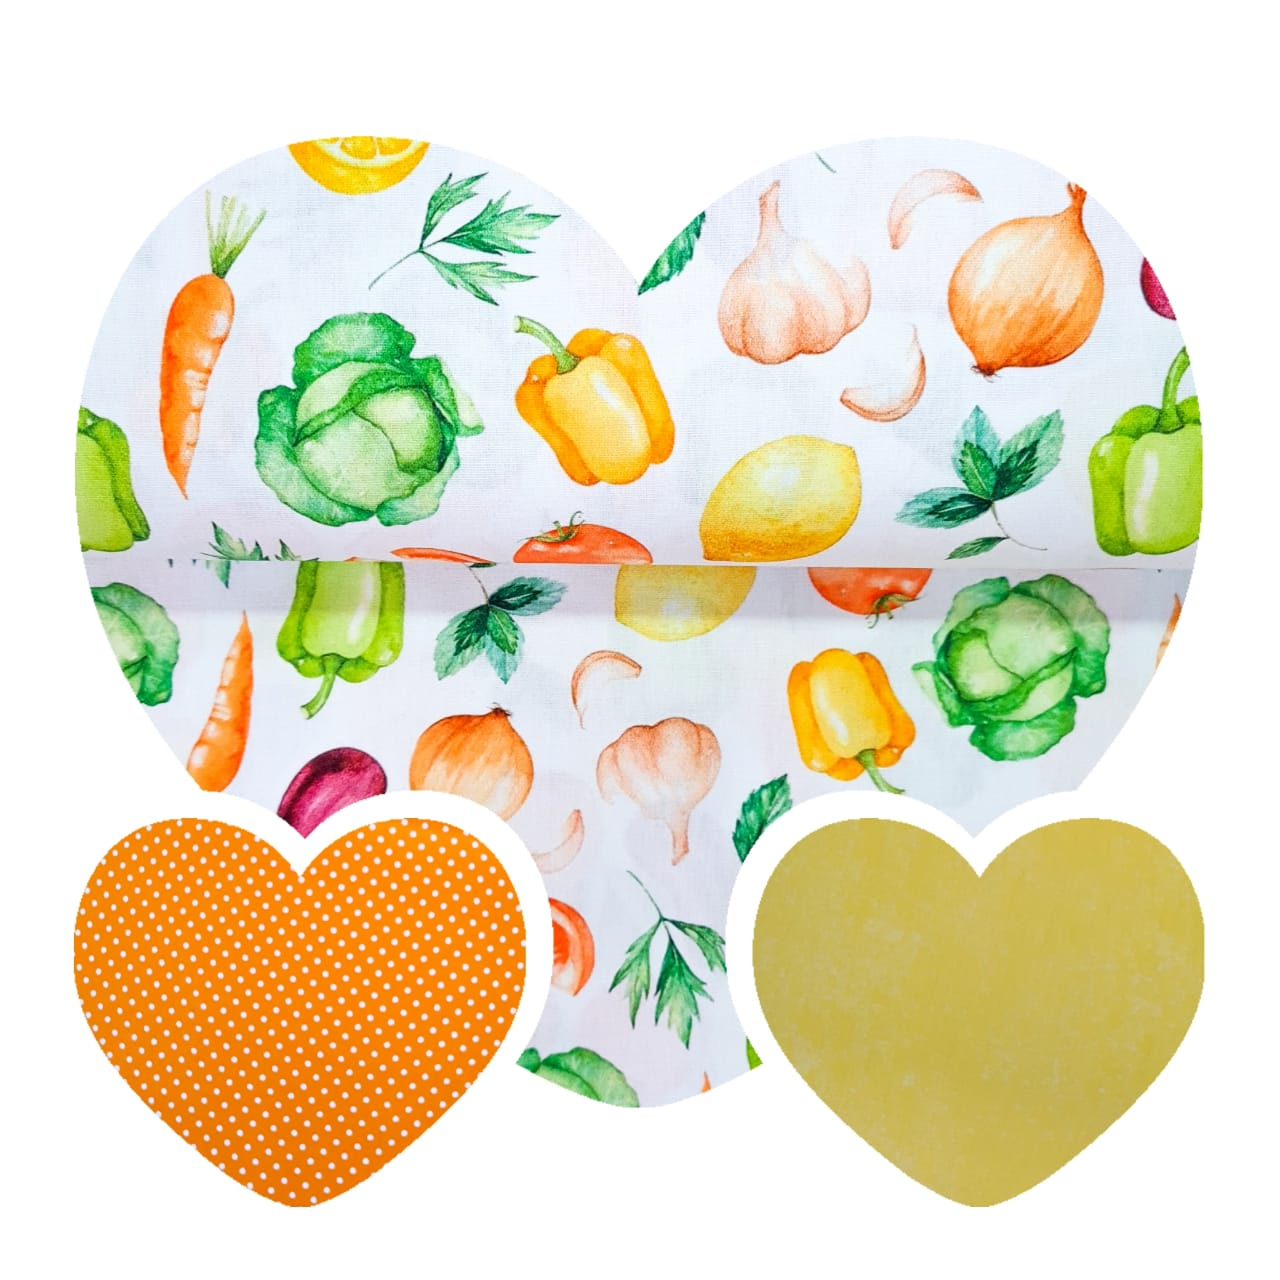 Kit de Tecidos Legumes + Poá + Poeira  (3 Cortes de 50x1,50)